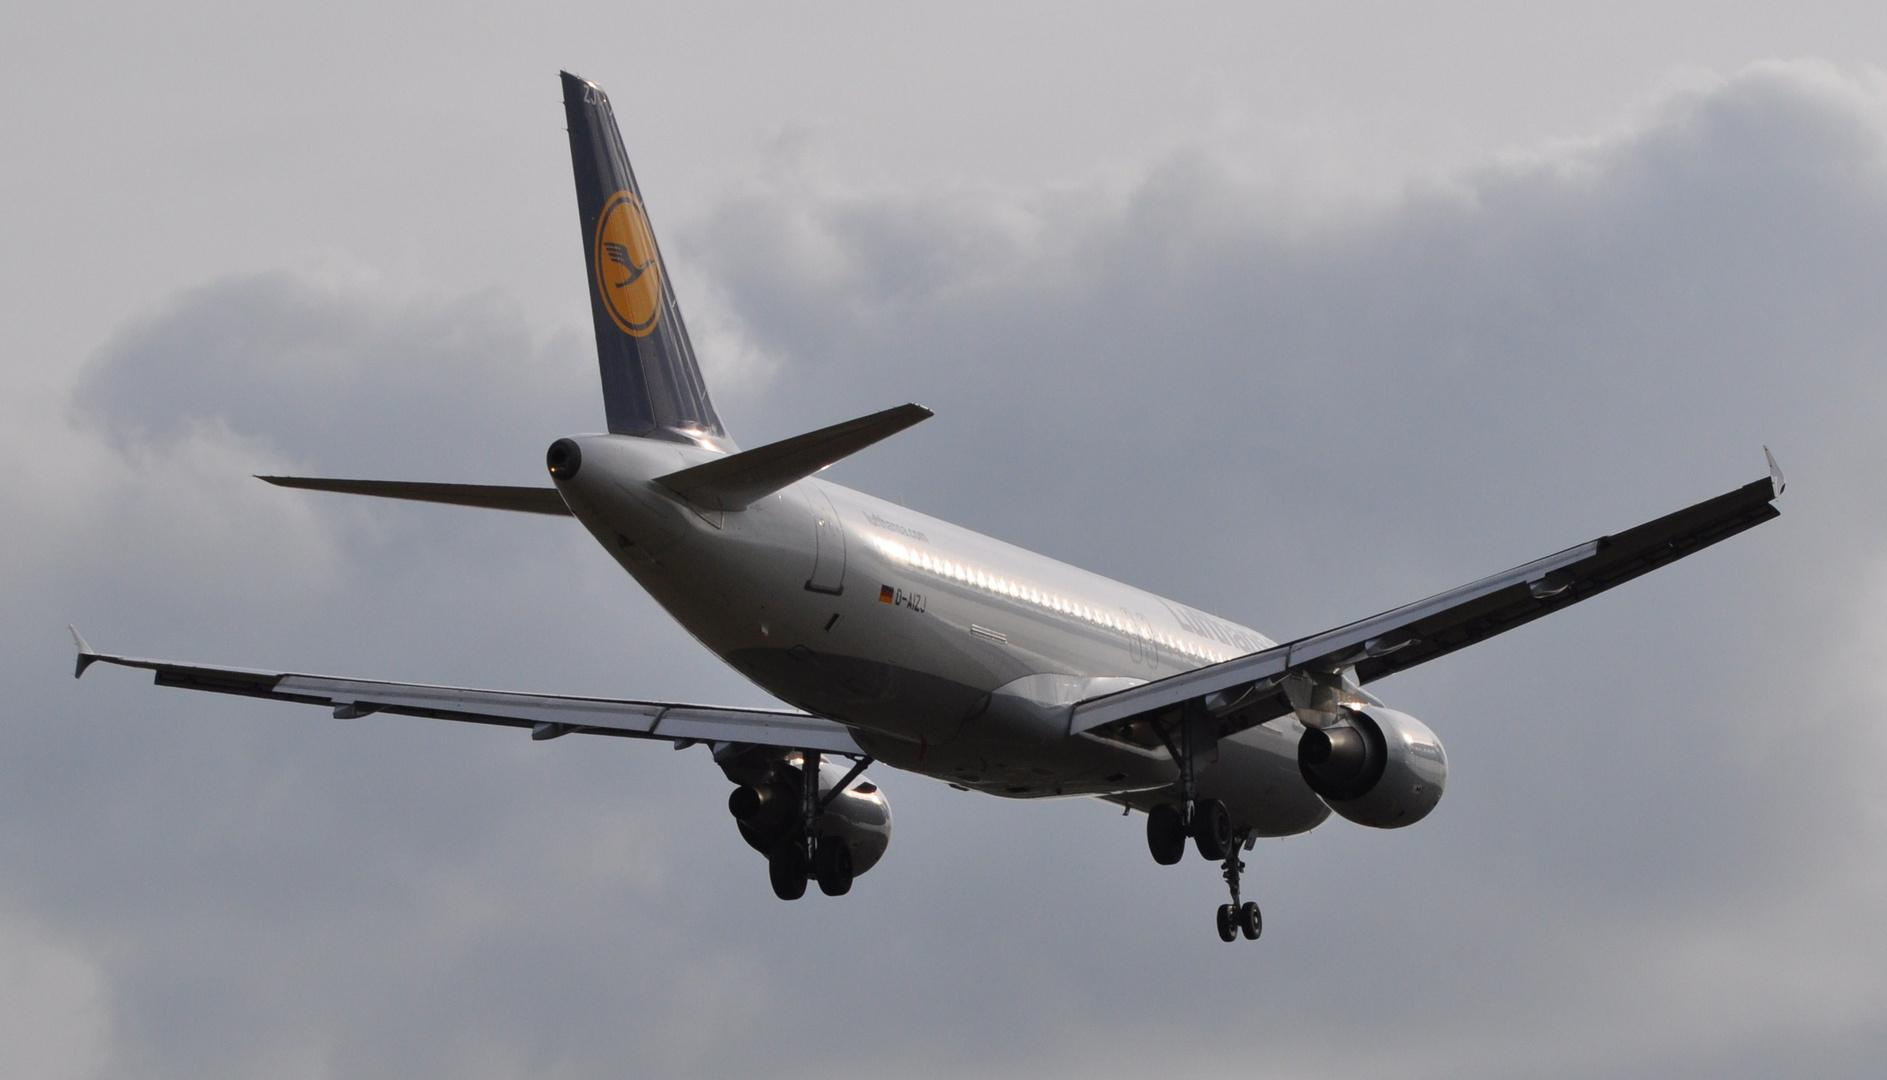 Frankfurt anflug auf neue Landebahn